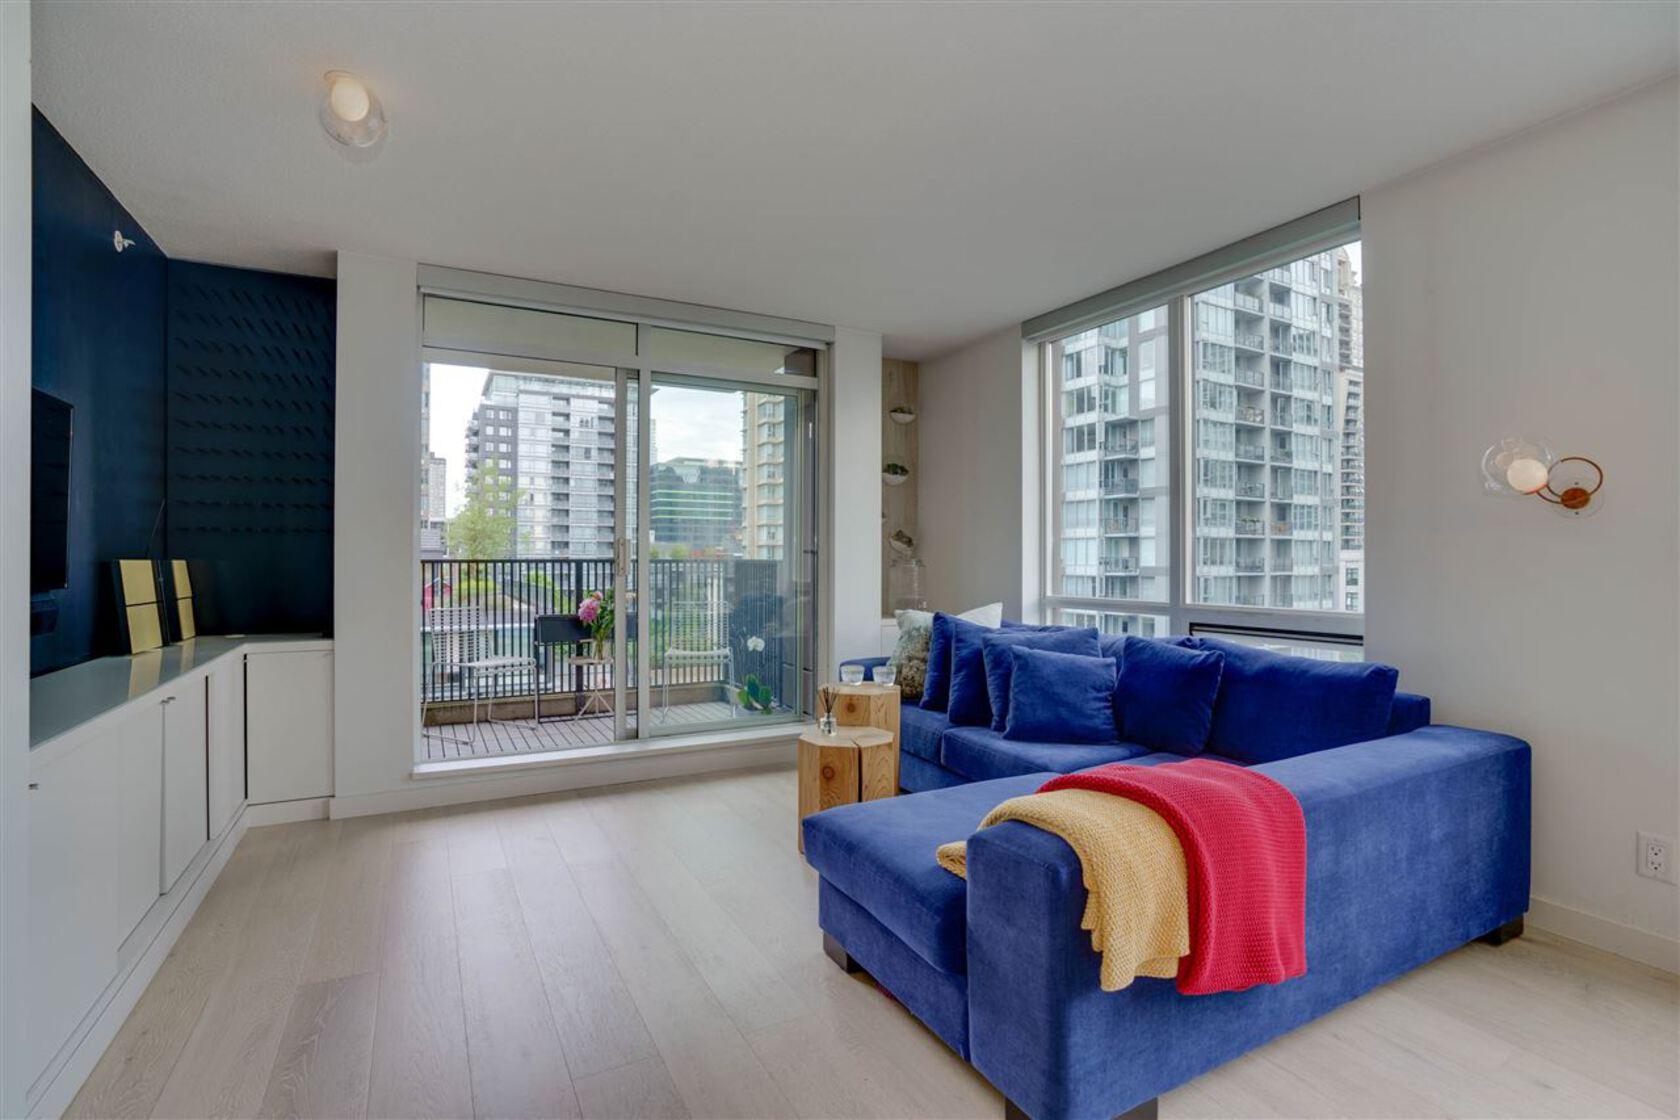 1055-homer-street-yaletown-vancouver-west-11 at 1105 - 1055 Homer Street, Yaletown, Vancouver West